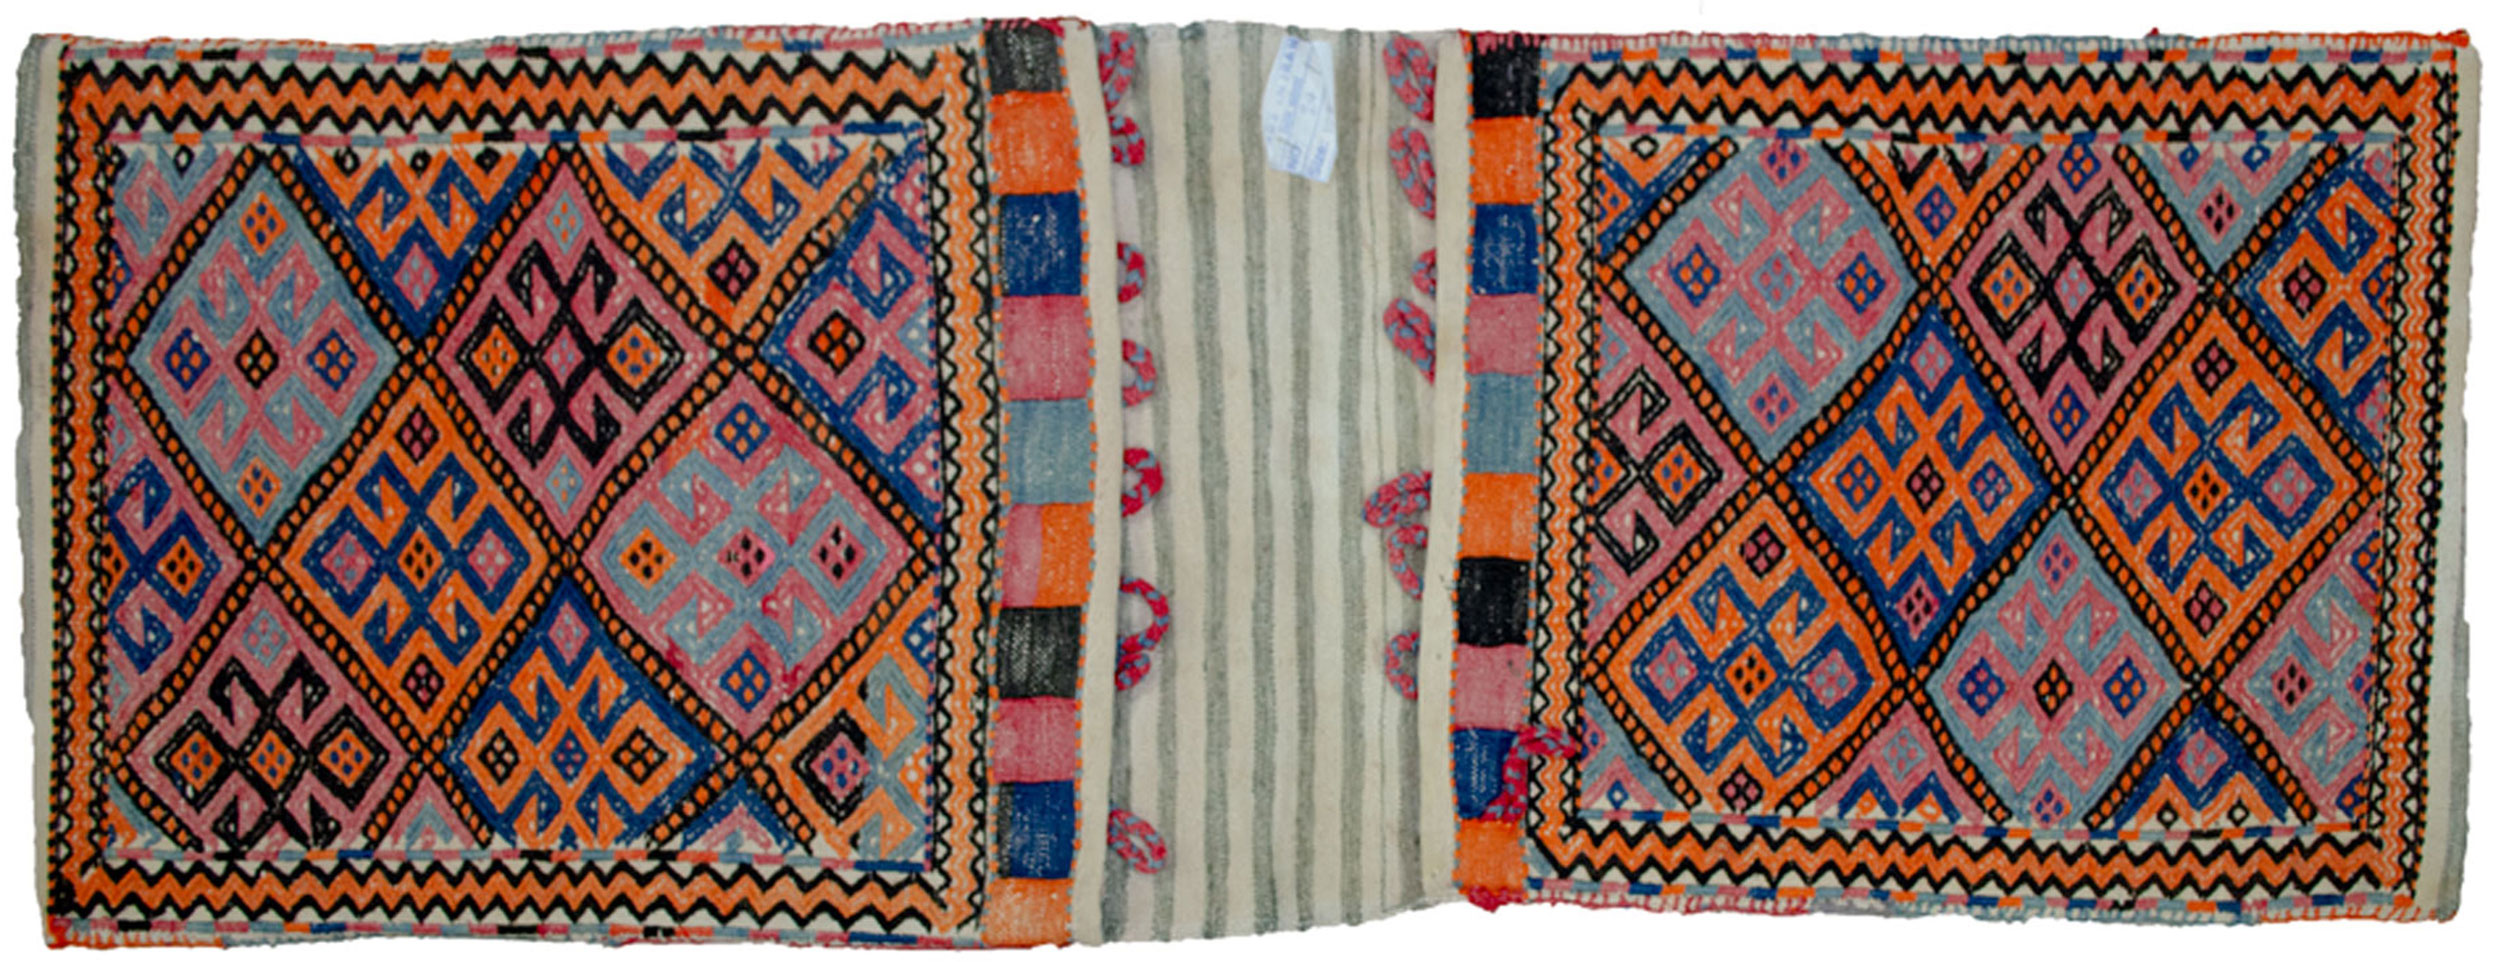 Antique Azarbijan Khorjin Bag 128x49cm